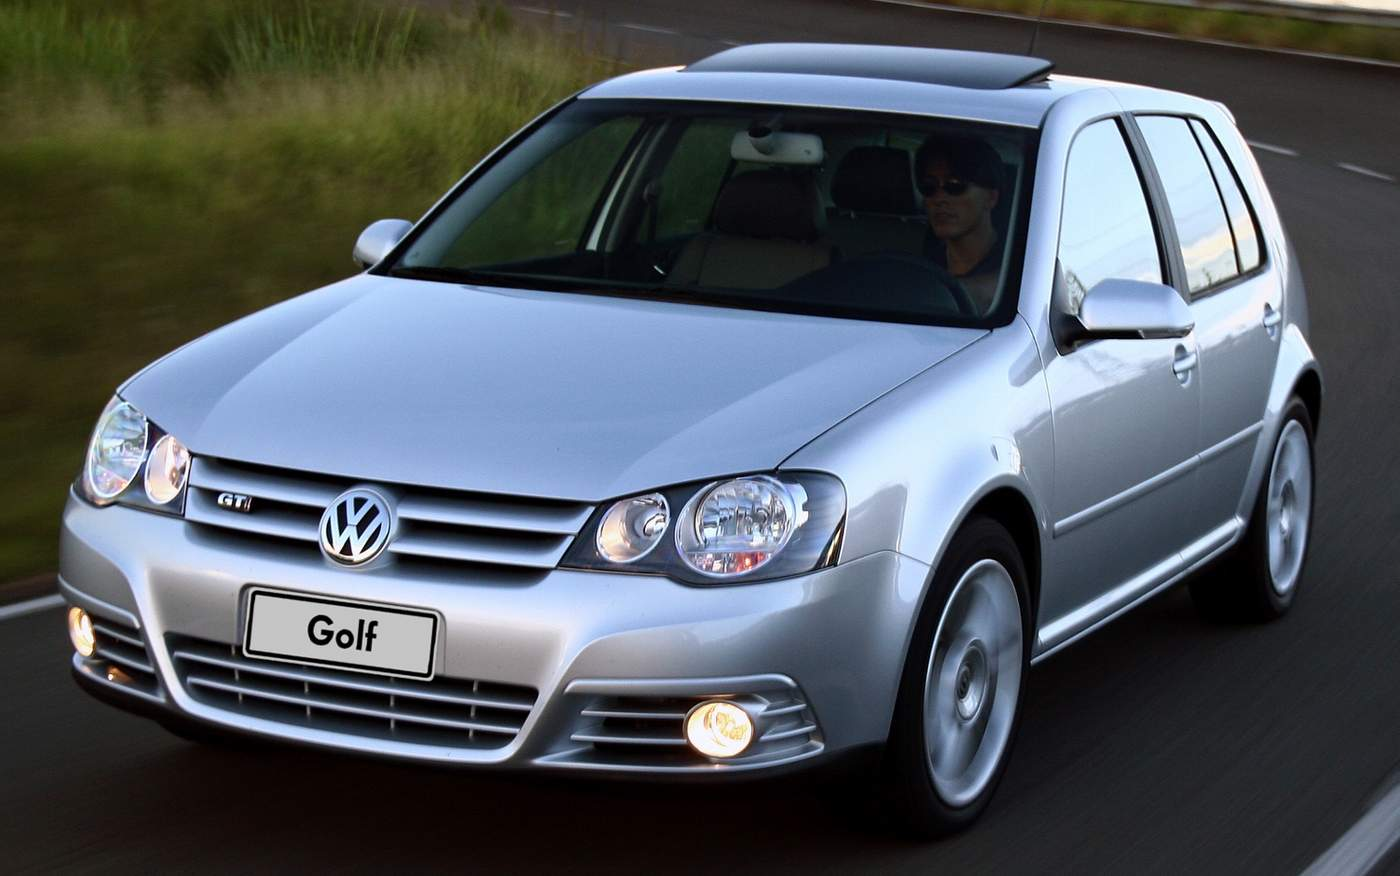 Volkswagen Golf GTI 193 cv